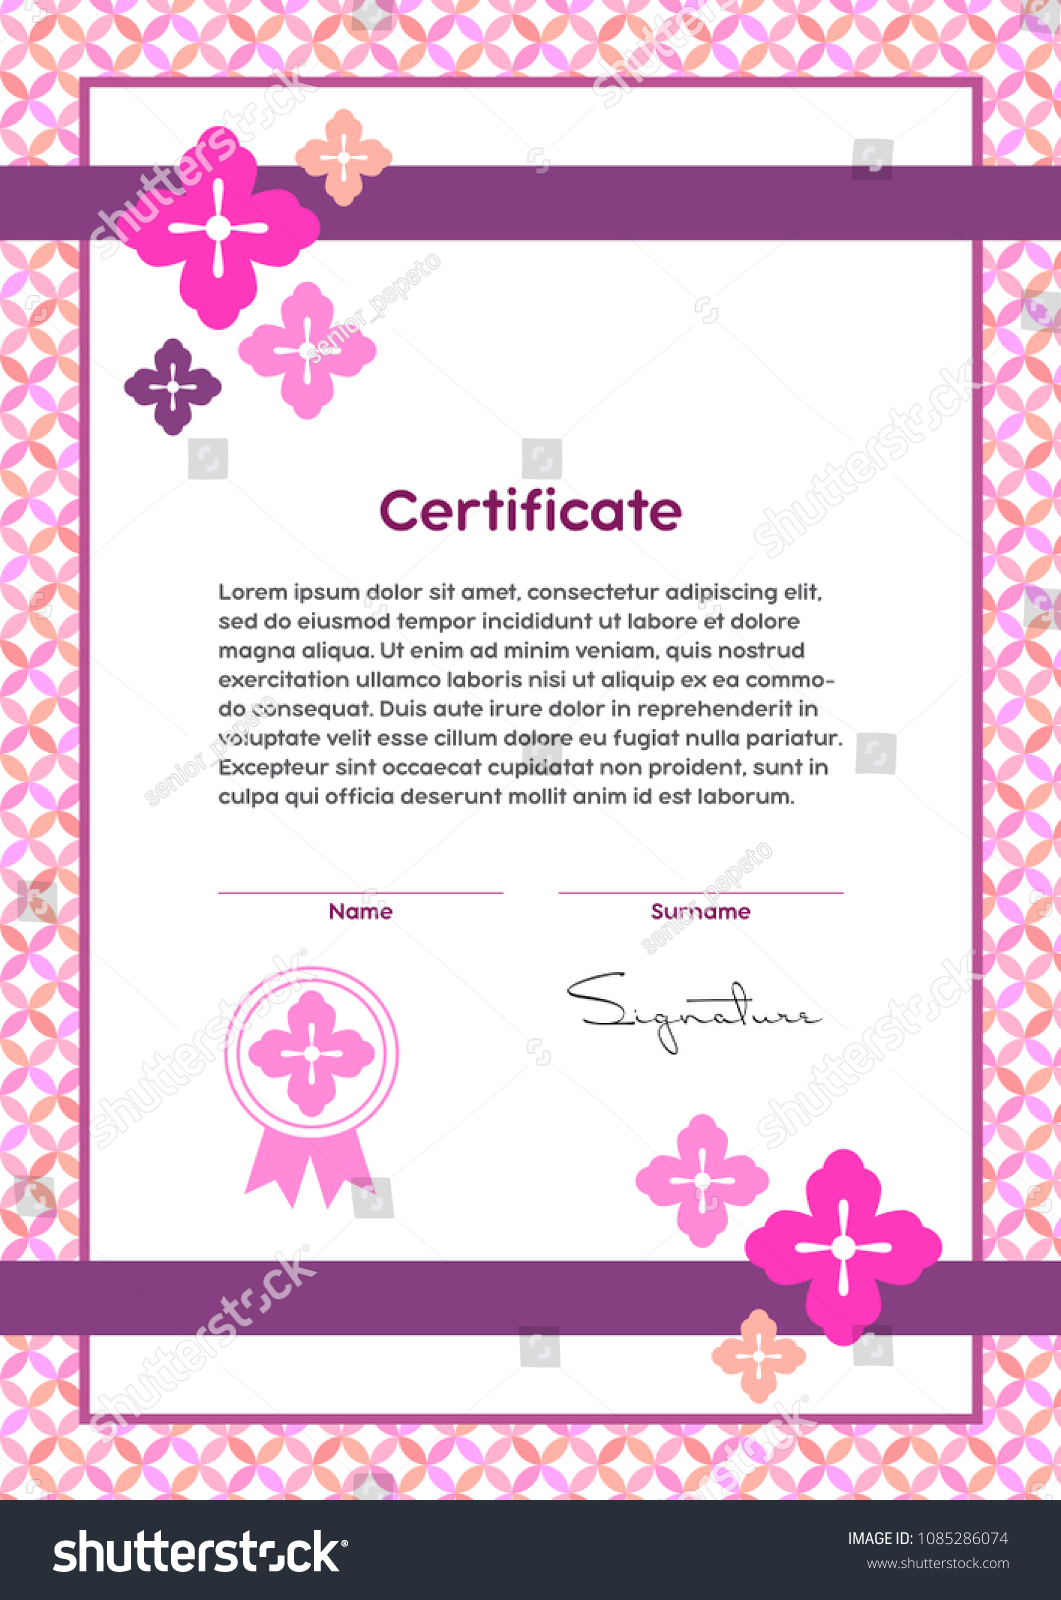 Vector certificate template japanese modern style stock vector 2018 vector certificate template japanese modern style beauty salon yoga spa makeup yelopaper Gallery